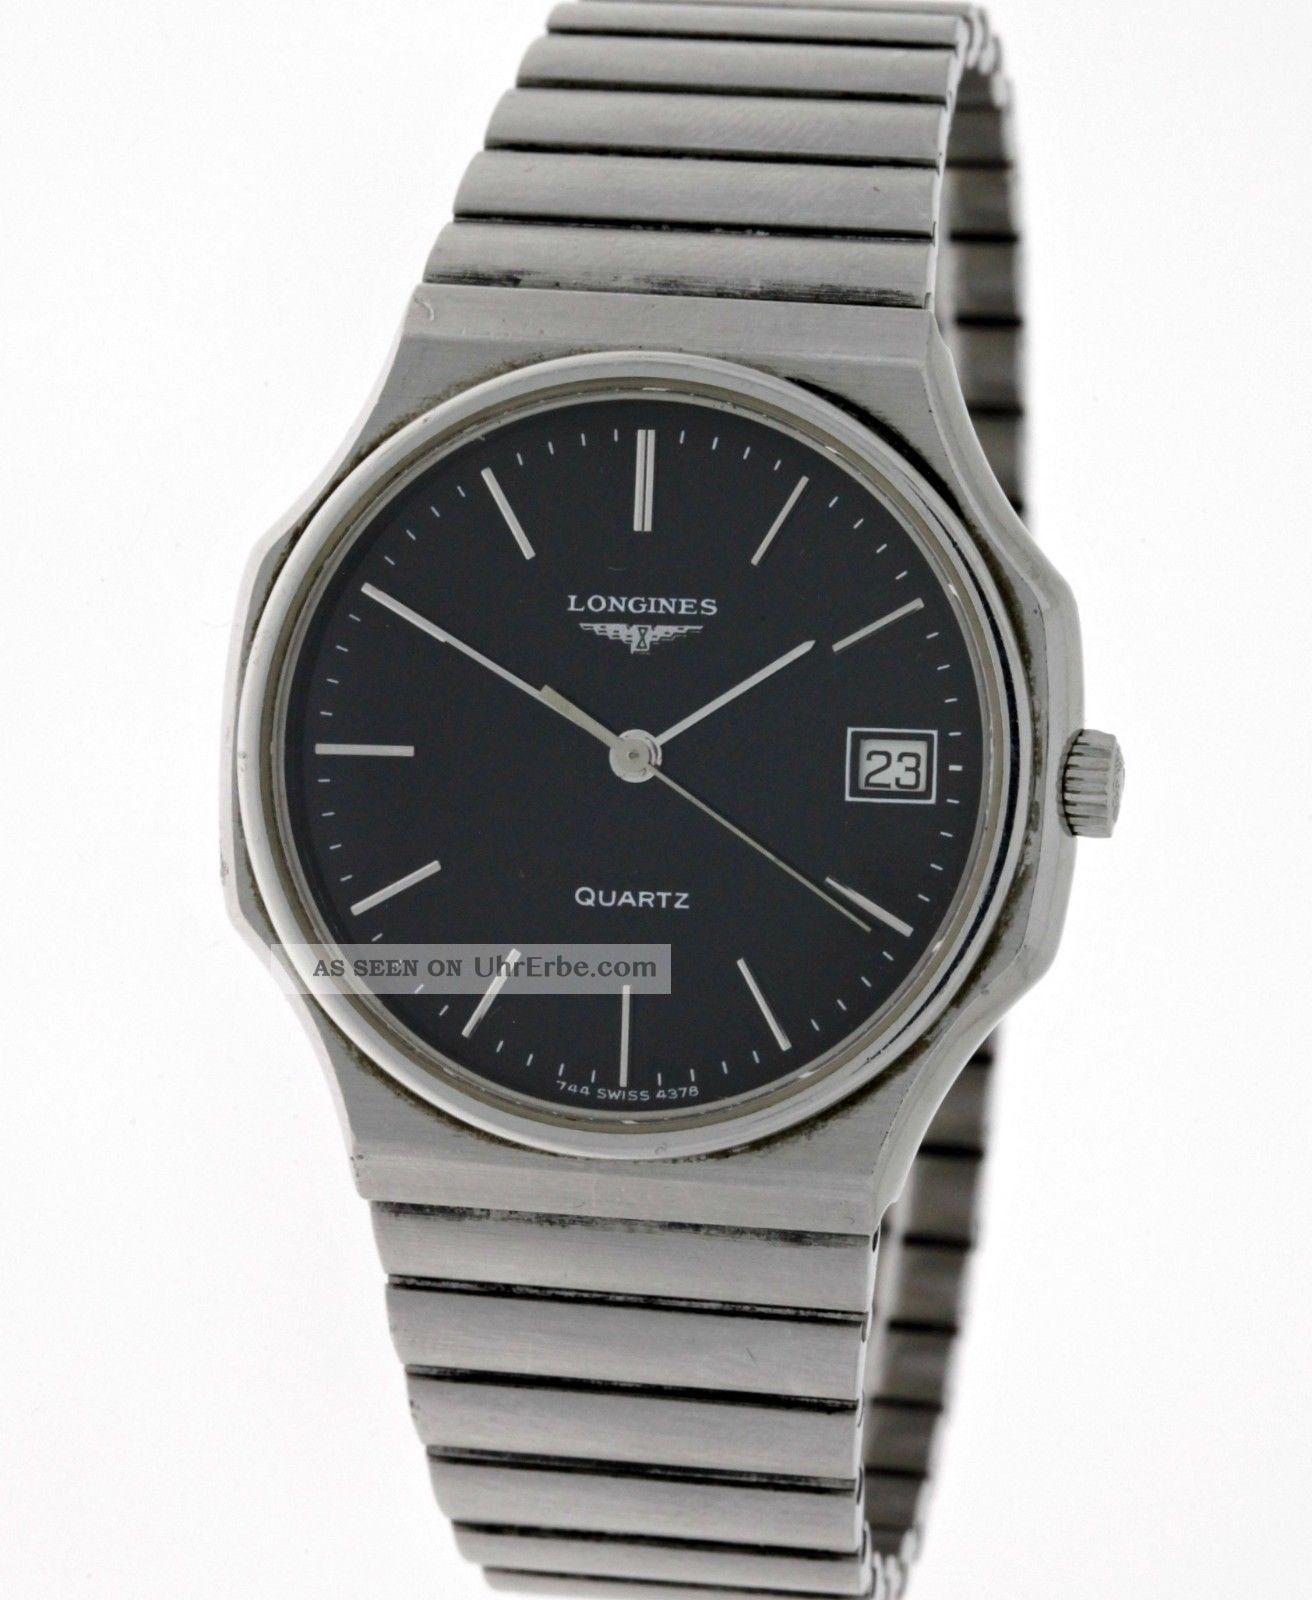 Seltene Vintage Longines Unisex Edelstahl Armbanduhr Ref.  4378 Kaliber L.  744.  2 Armbanduhren Bild